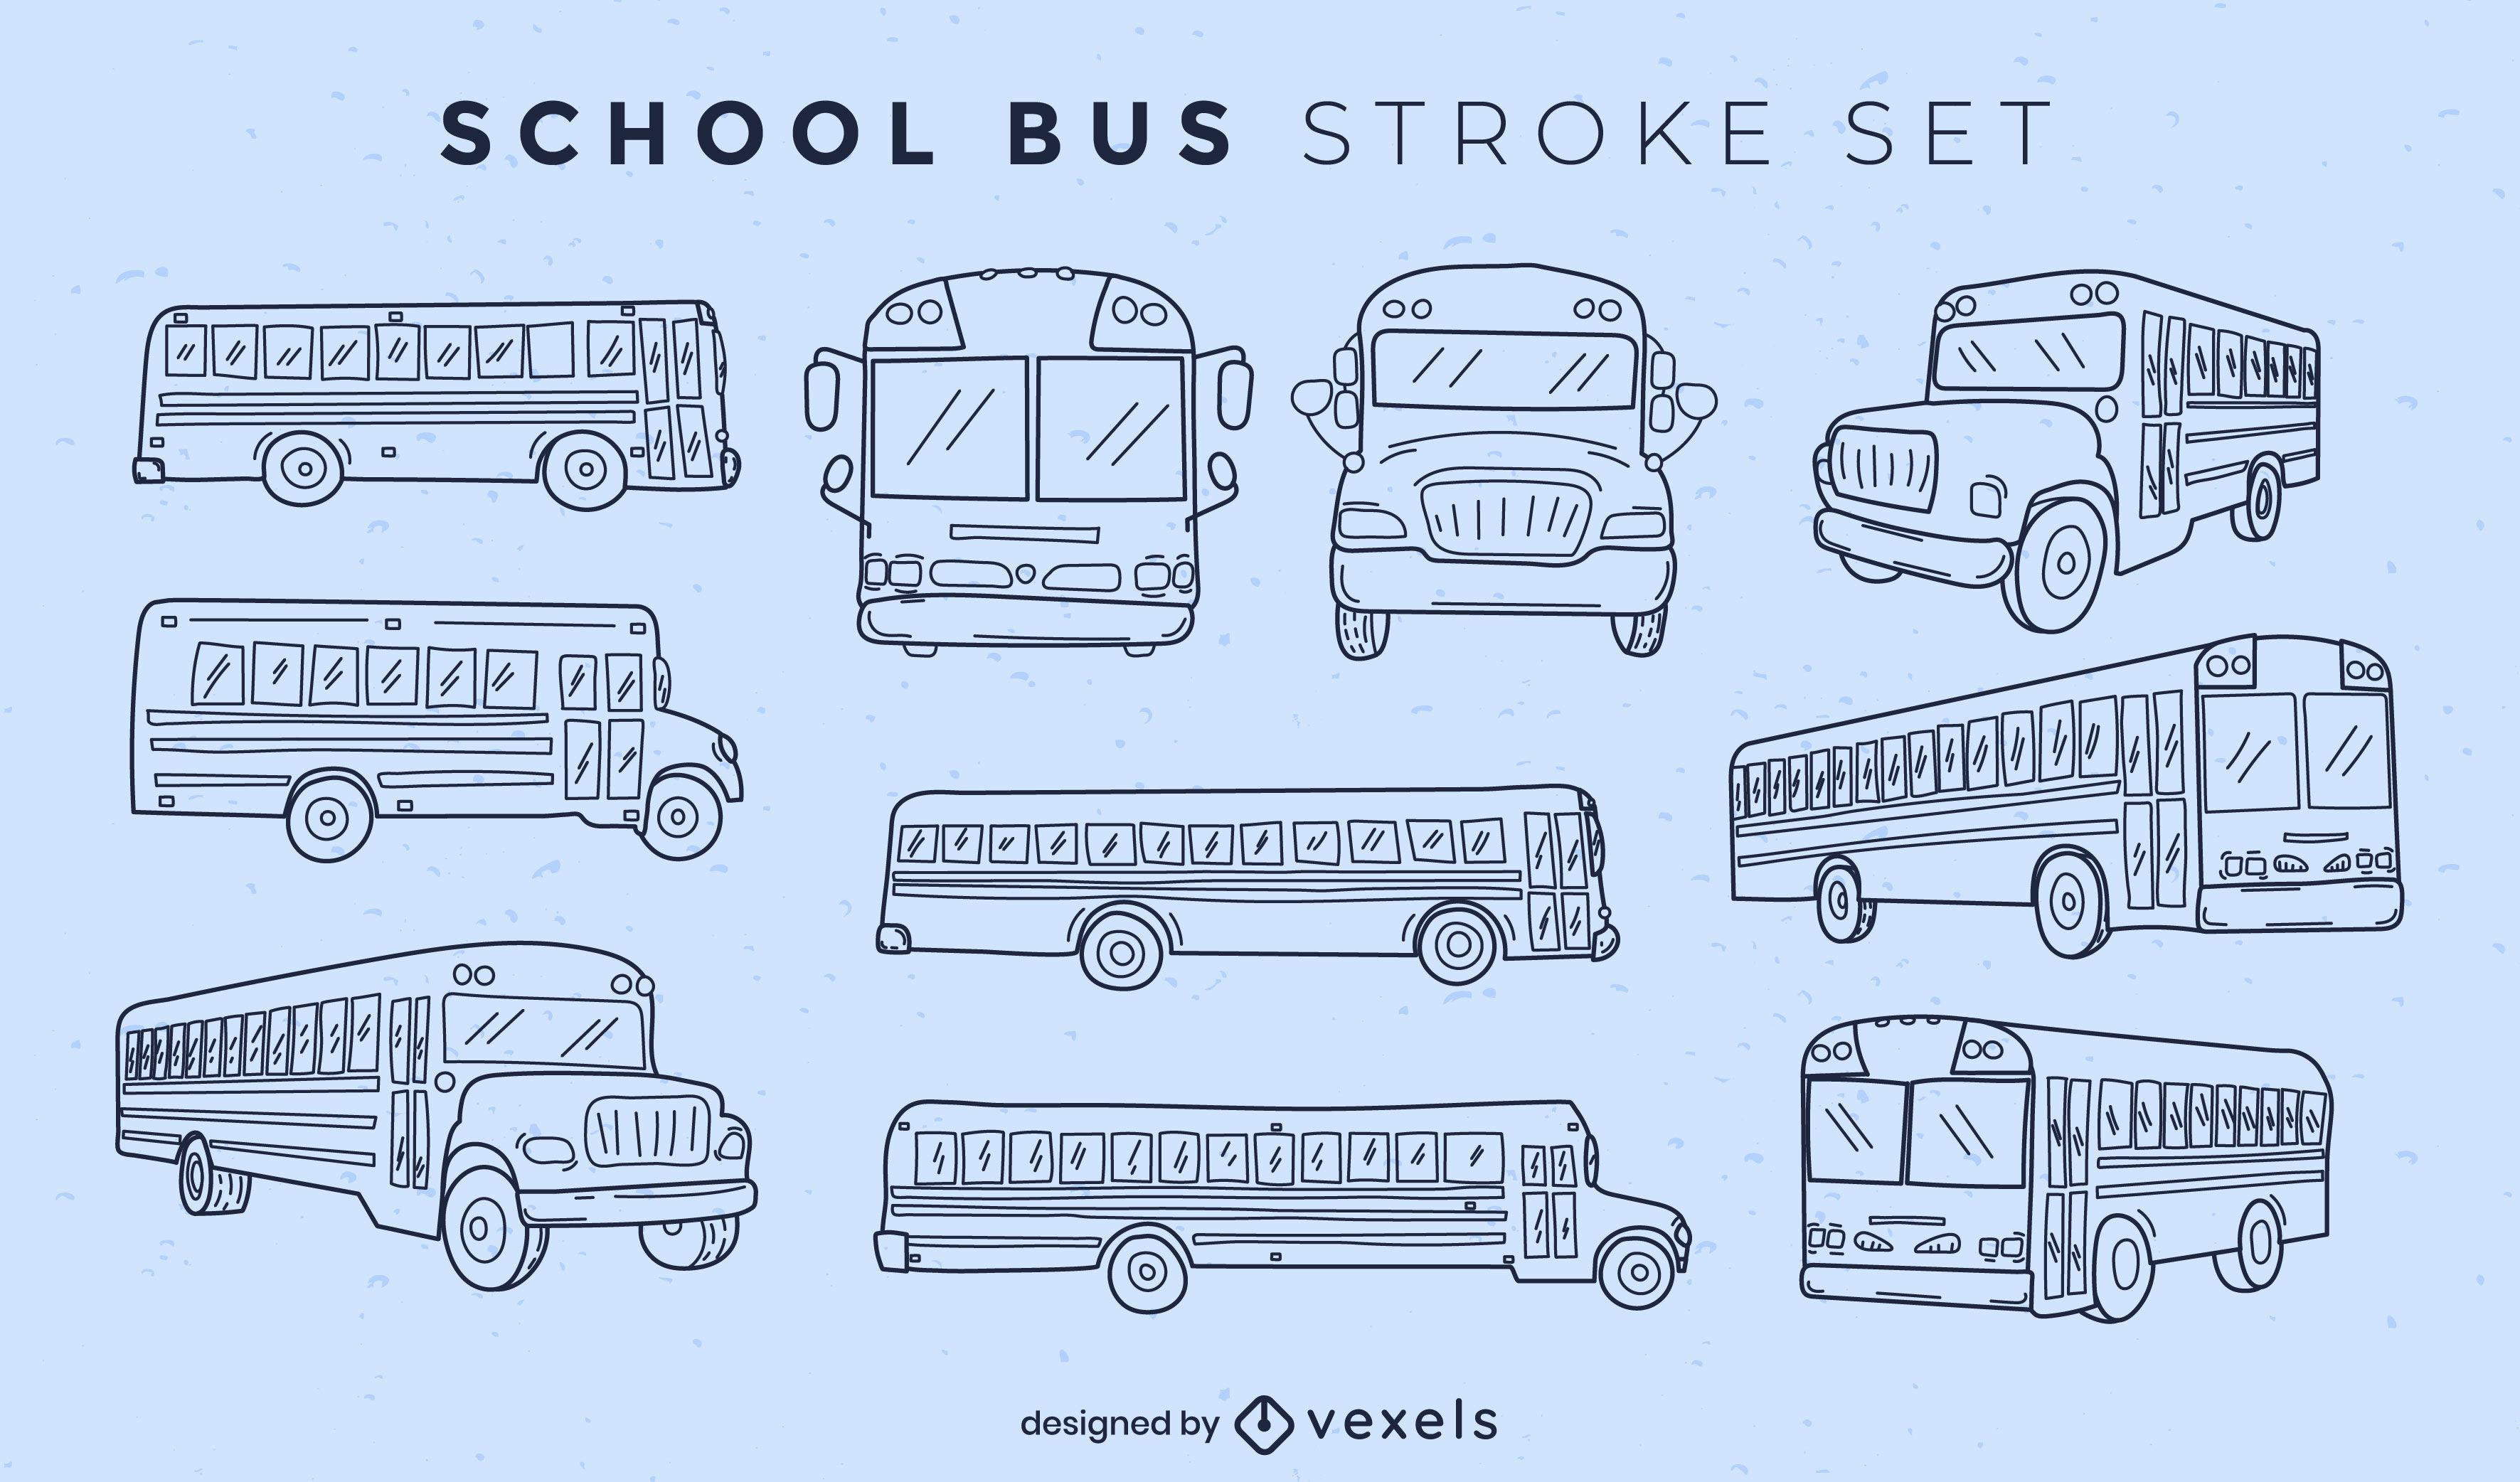 Set of school buses stroke